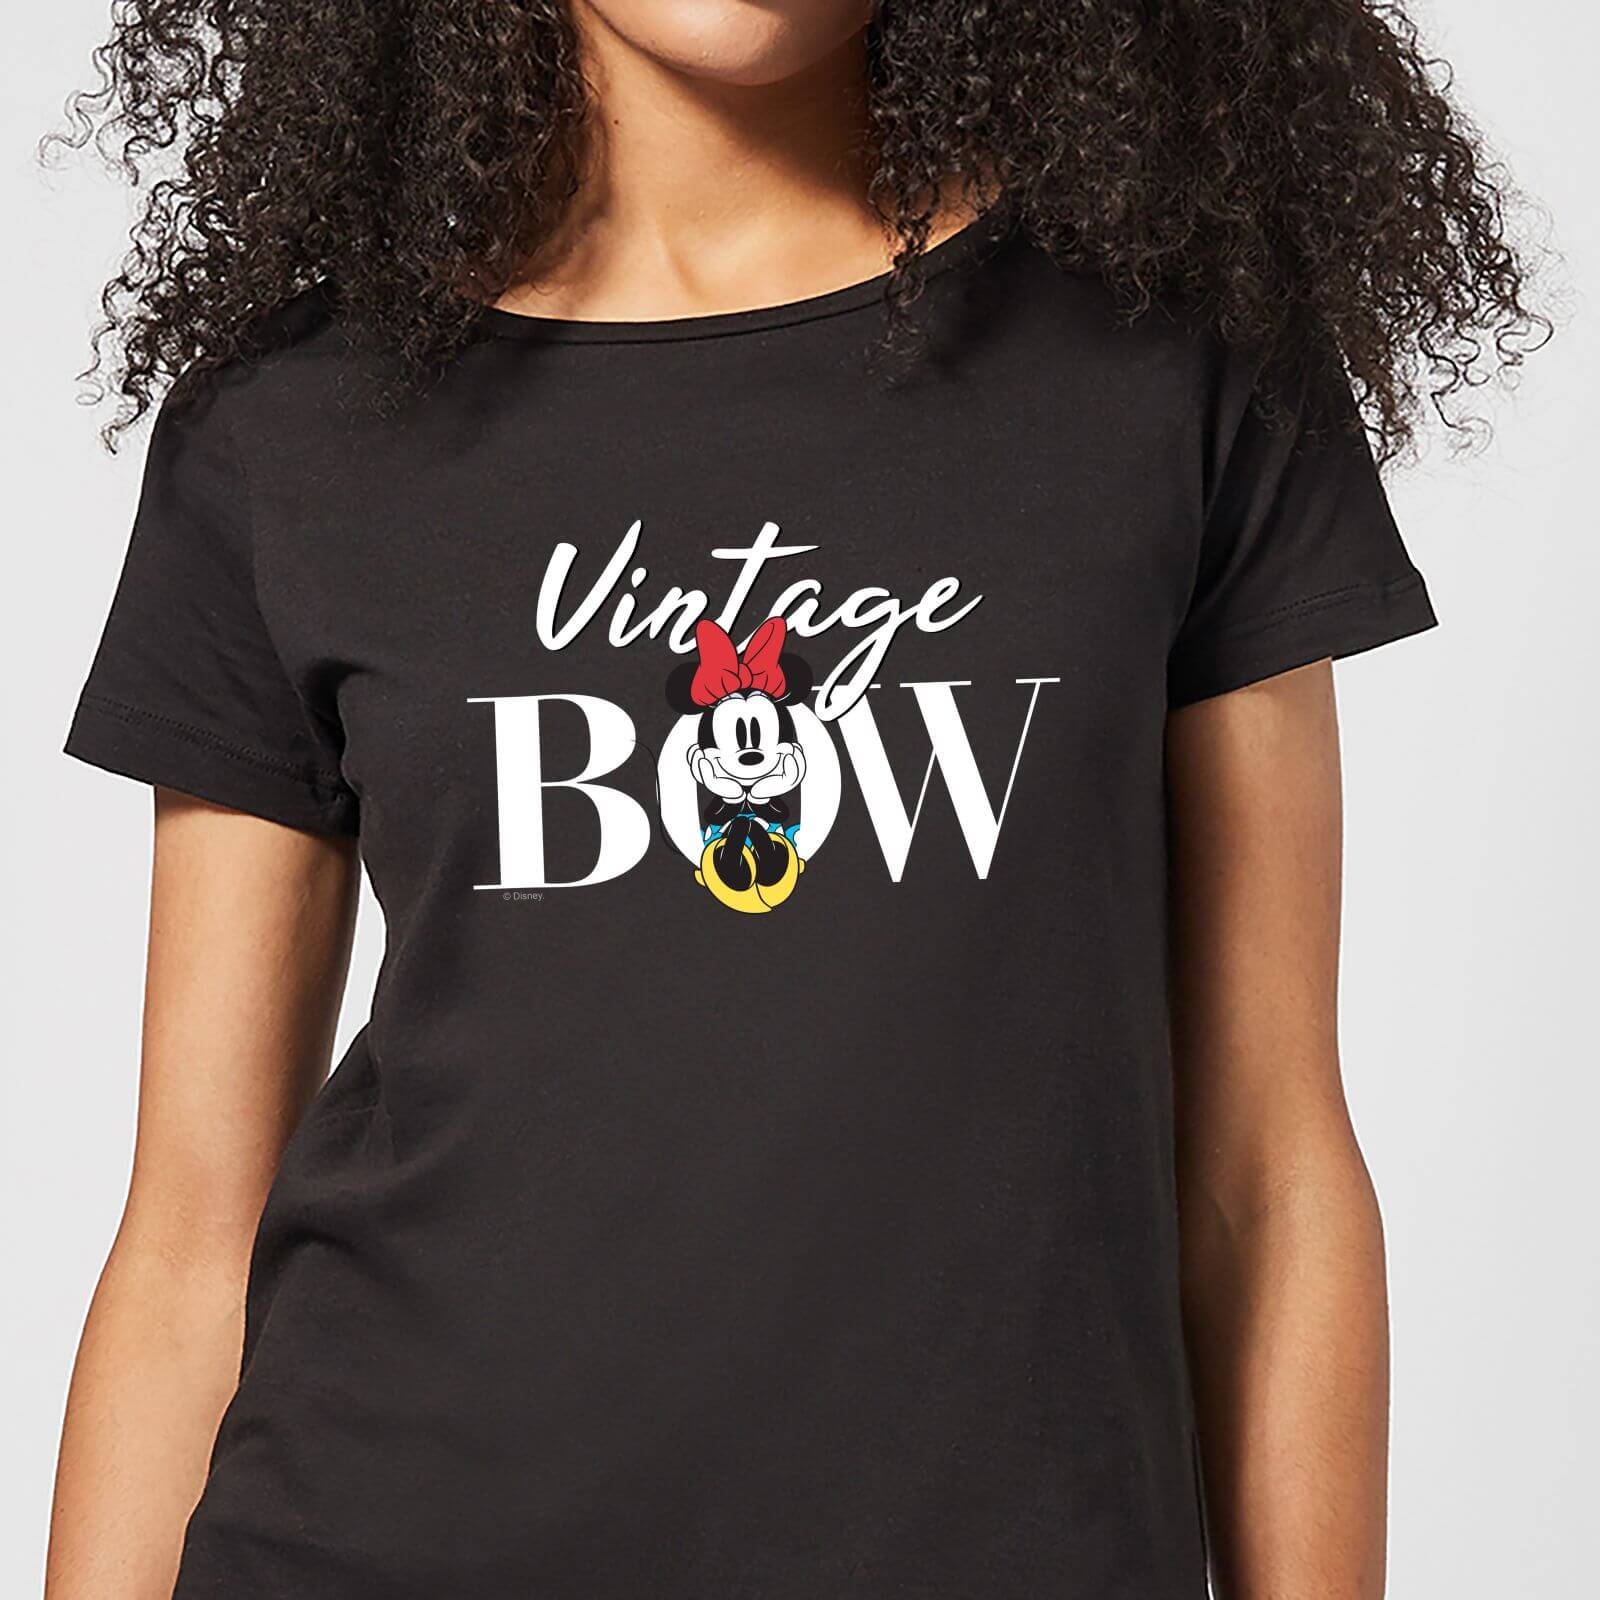 Disney Disney Minnie Mouse Vintage Bow Women's T-Shirt - Black - 3XL - Black